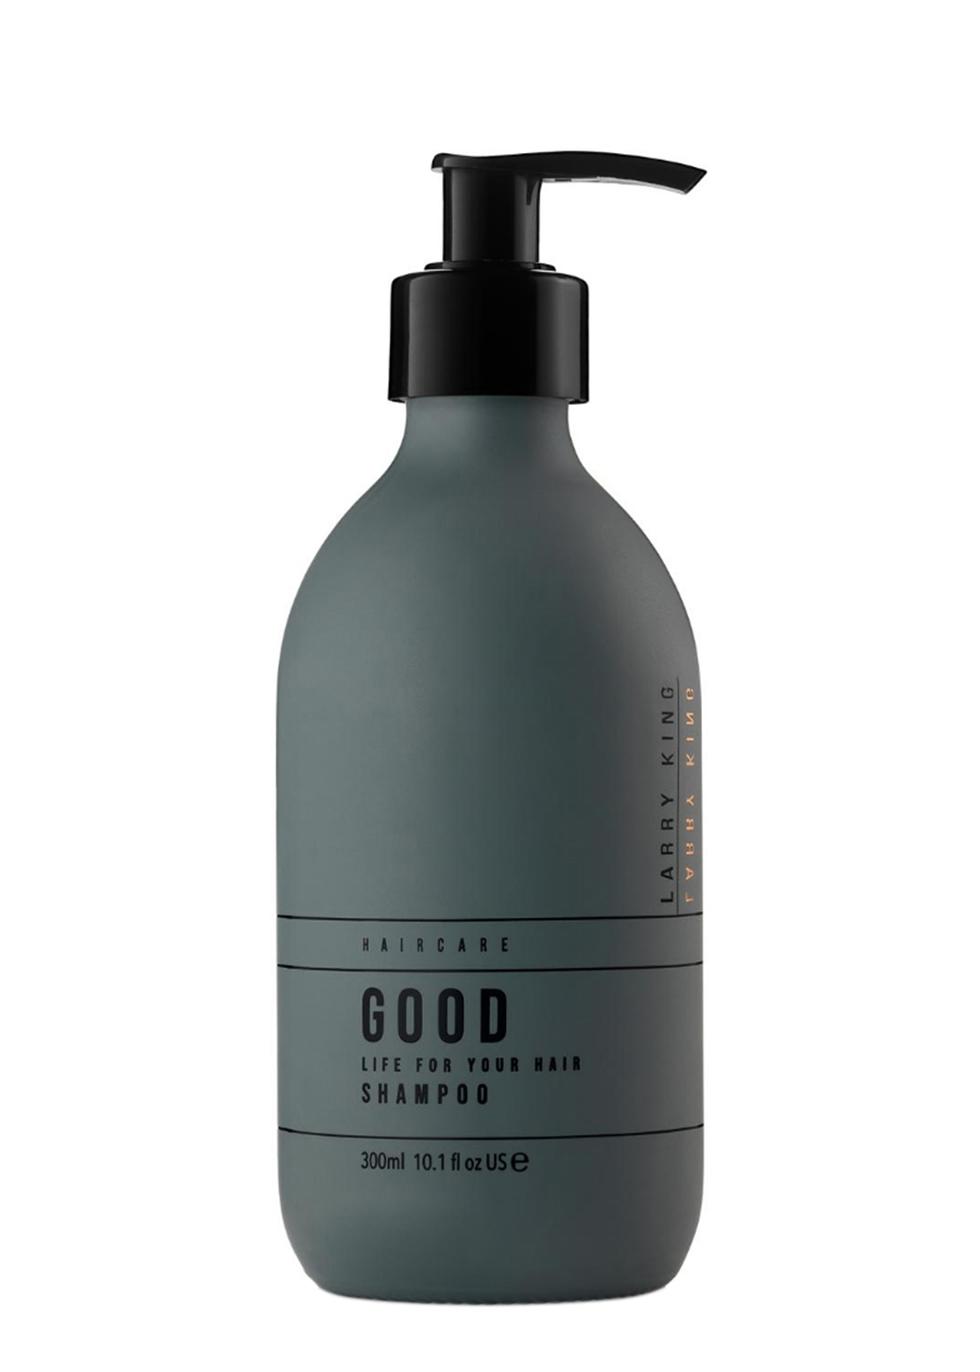 Good Life Shampoo Bottle 300ml